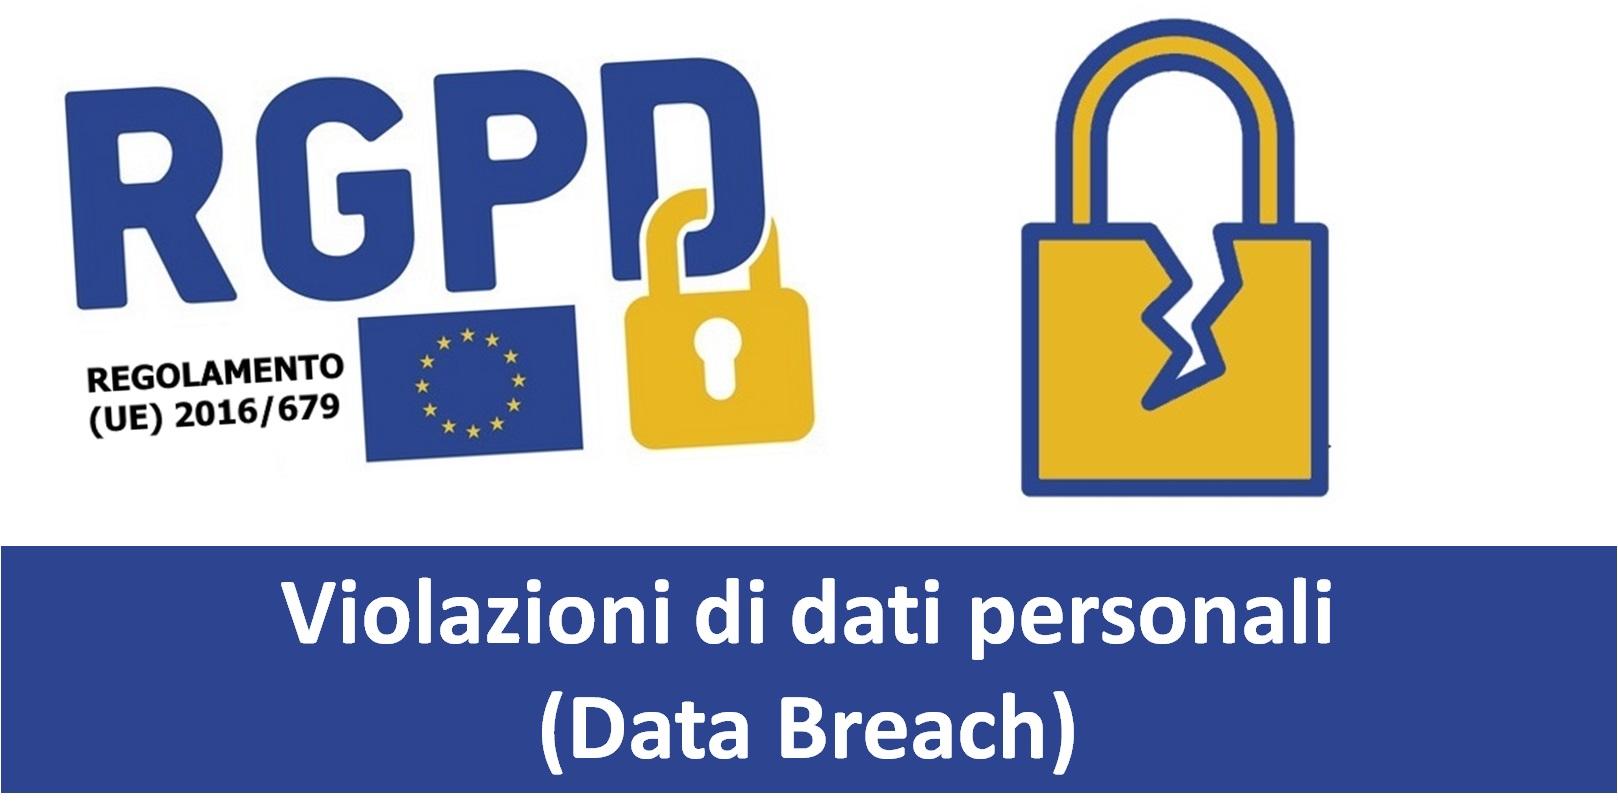 https://www.garanteprivacy.it/documents/10160/0/immagine+data+breach+4+%283%29.jpg/47dc6b05-e007-06fe-c749-b6ad4f2e27c9?t=1547204308041